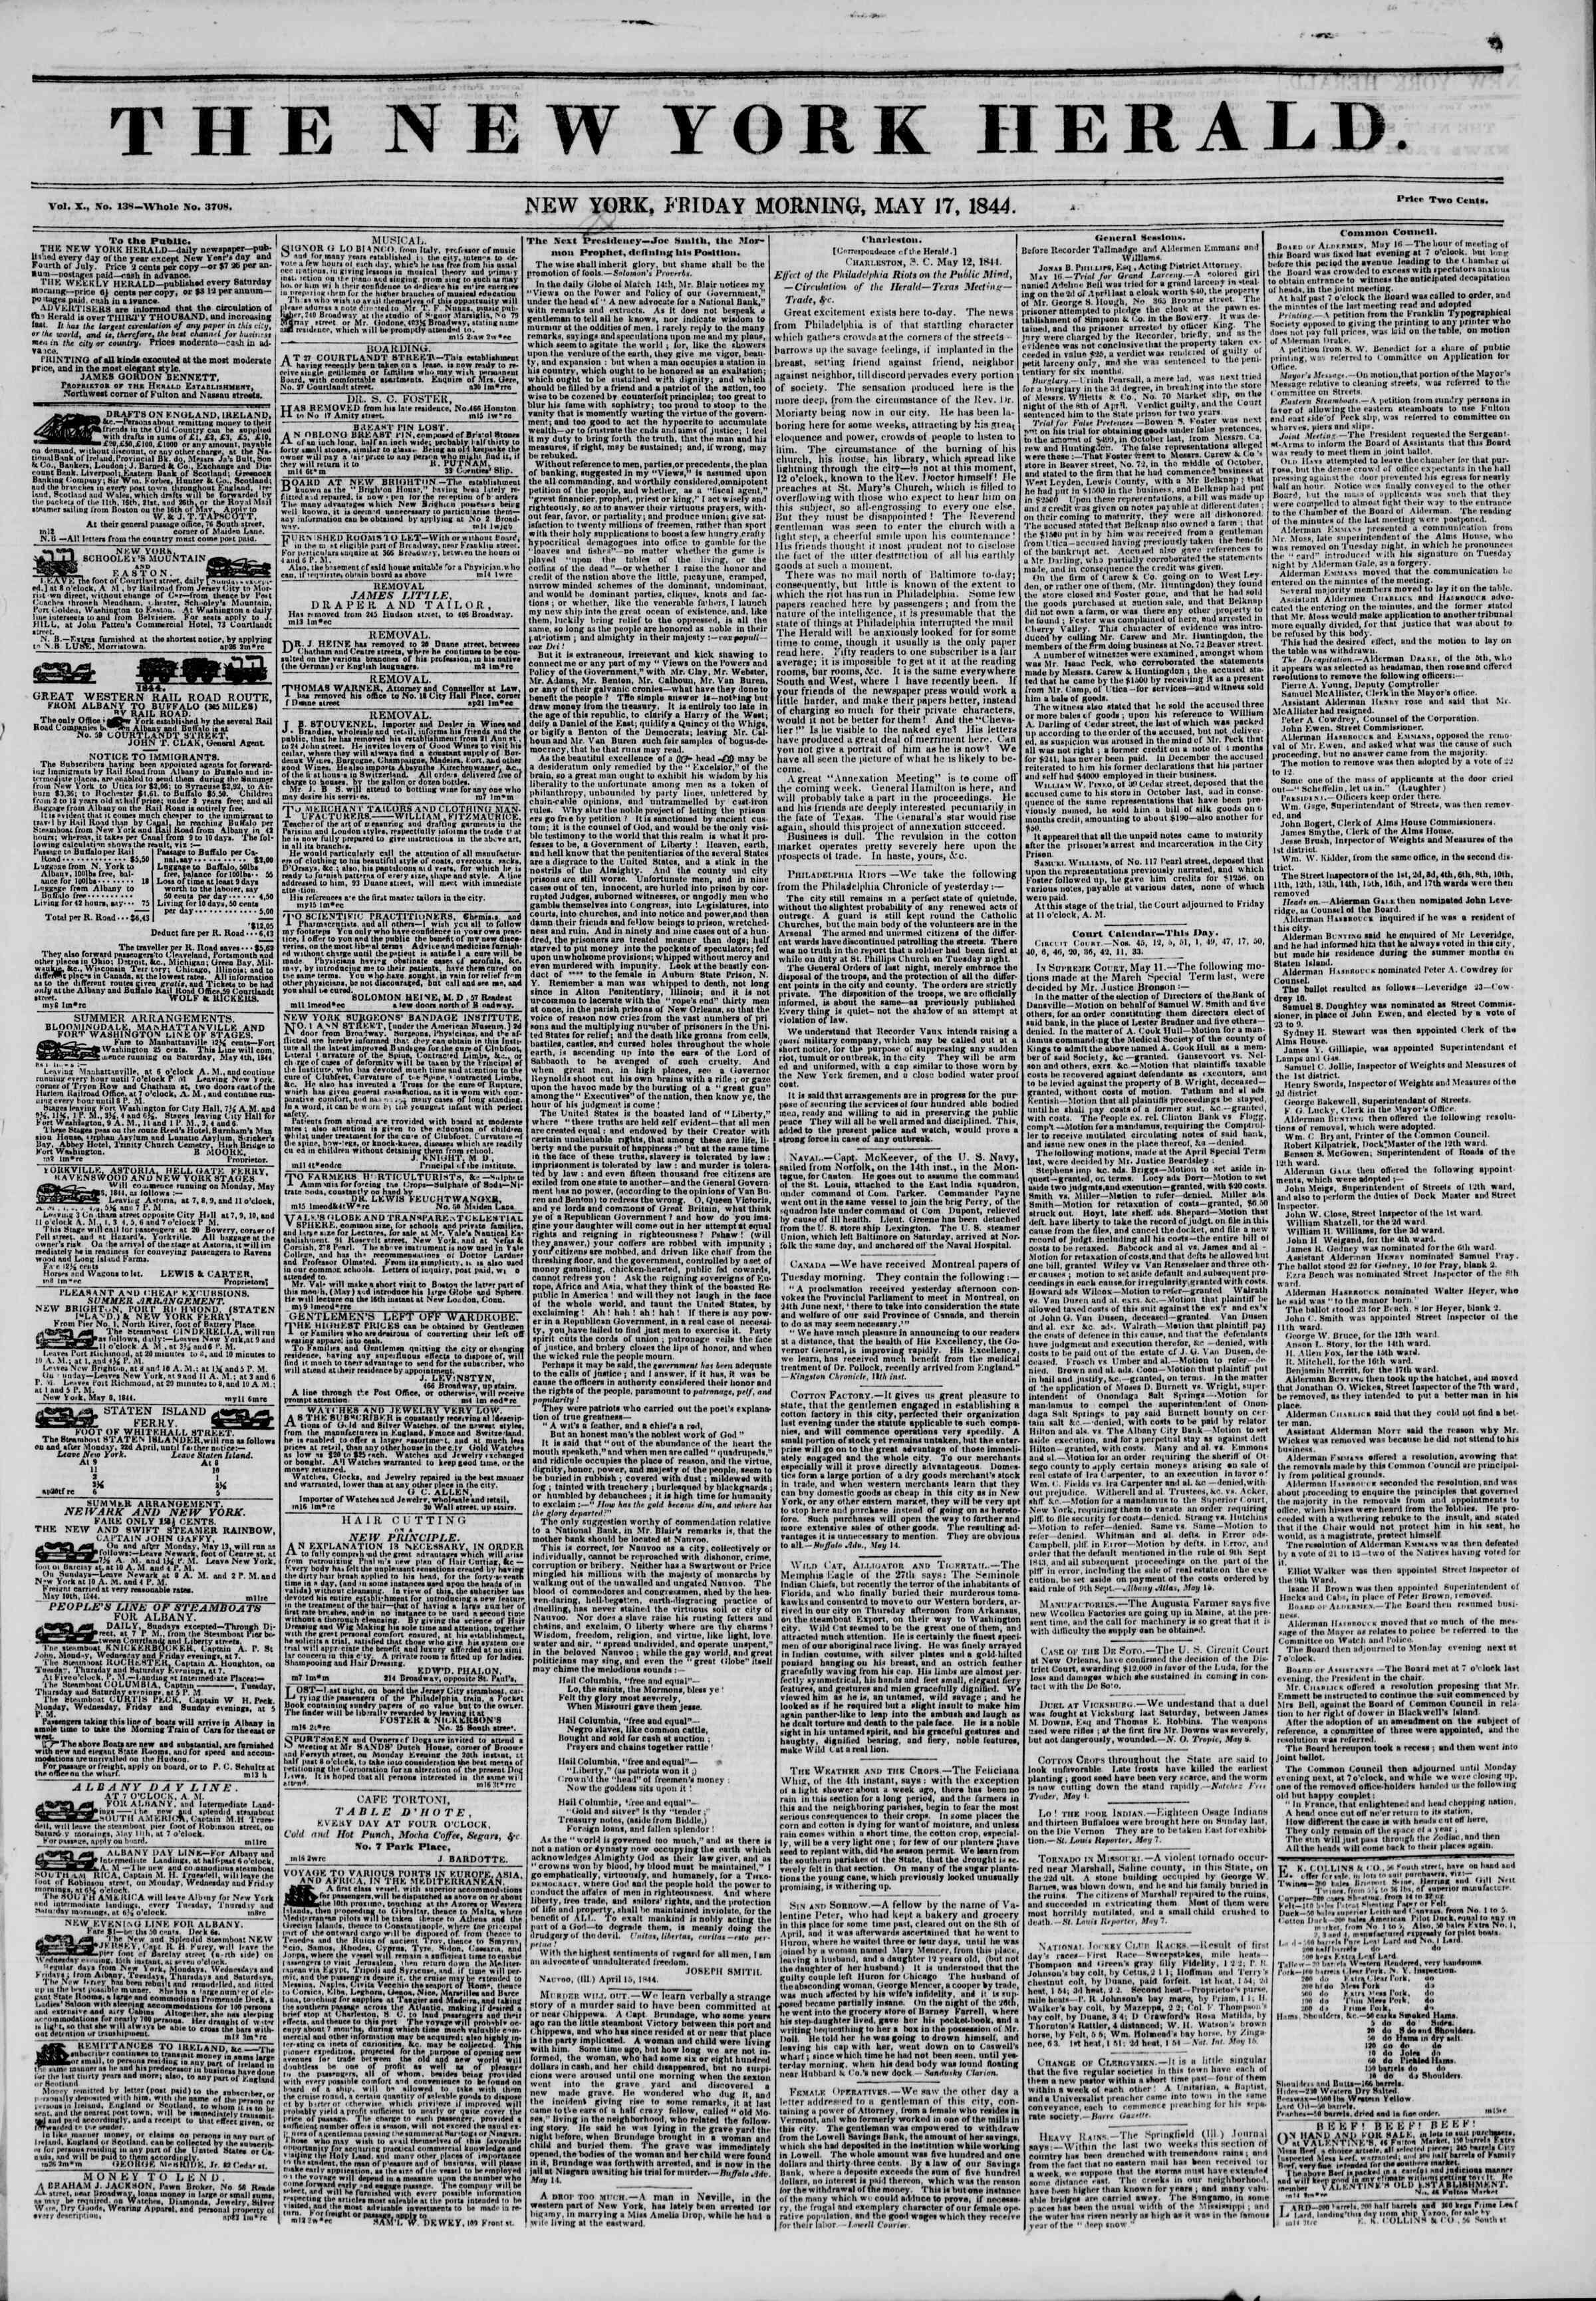 May 17, 1844 Tarihli The New York Herald Gazetesi Sayfa 1